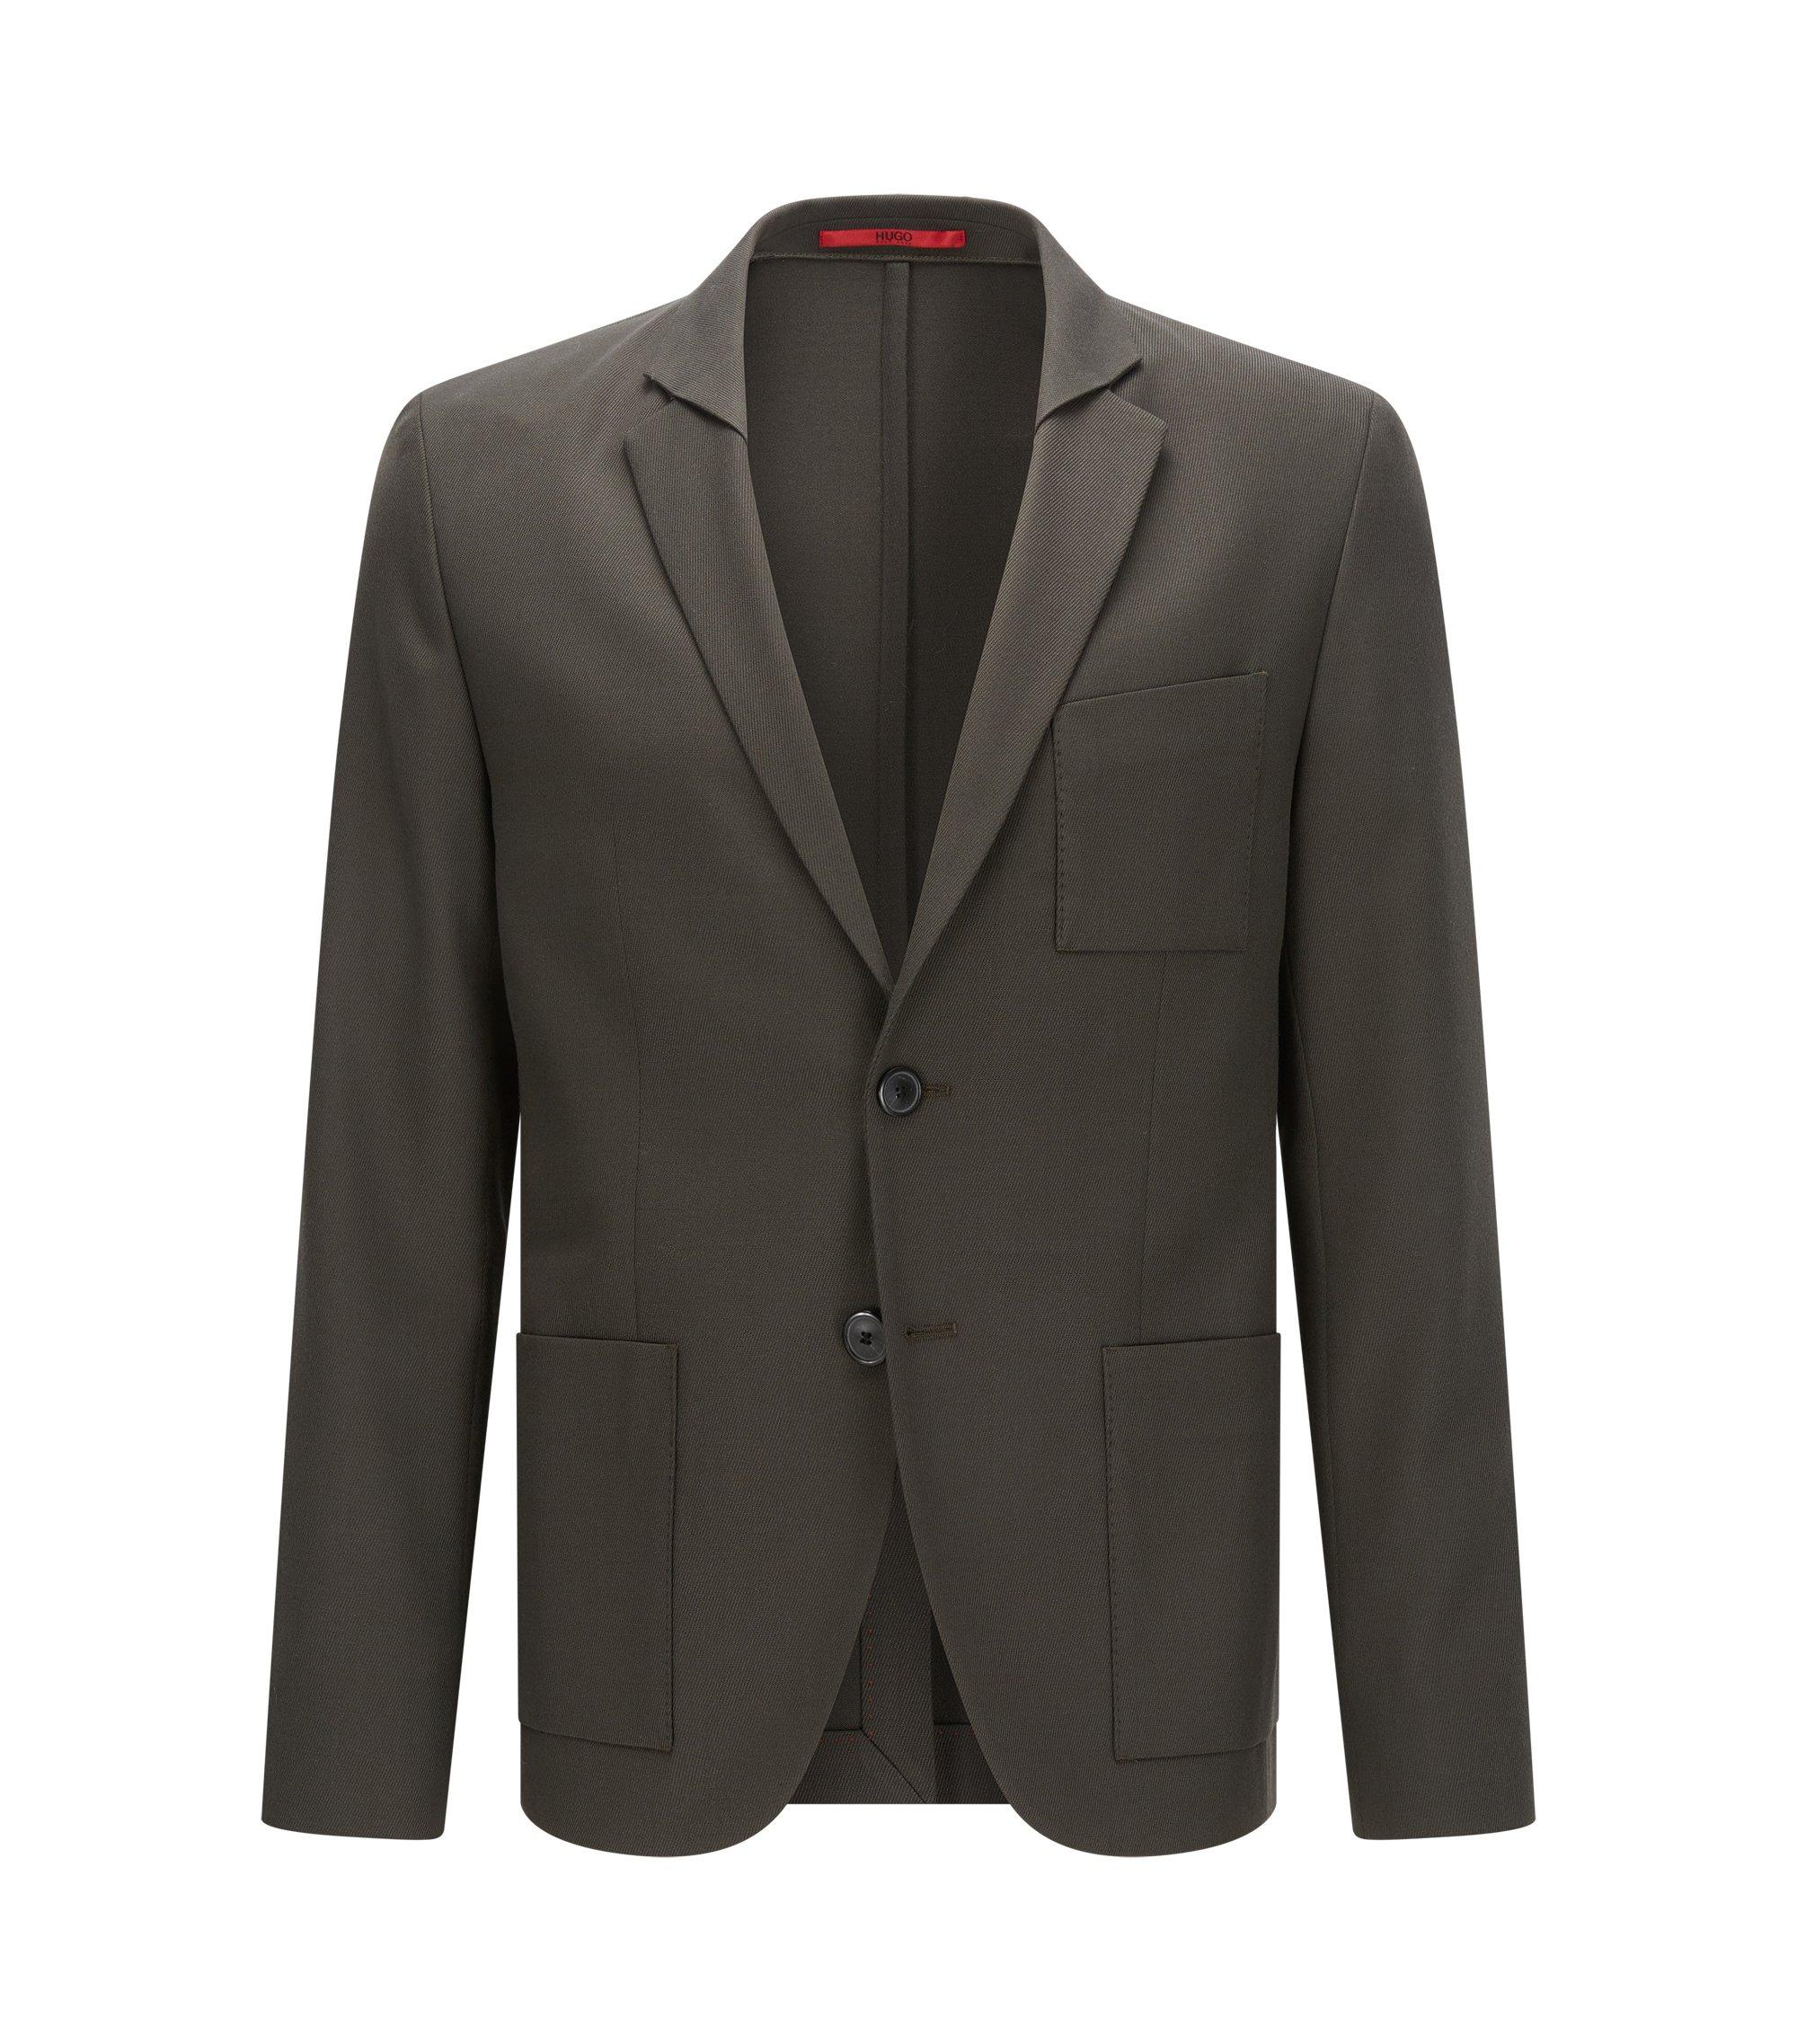 Wool Blend Sport Coat, Extra Slim Fit   Arthor, Dark Green